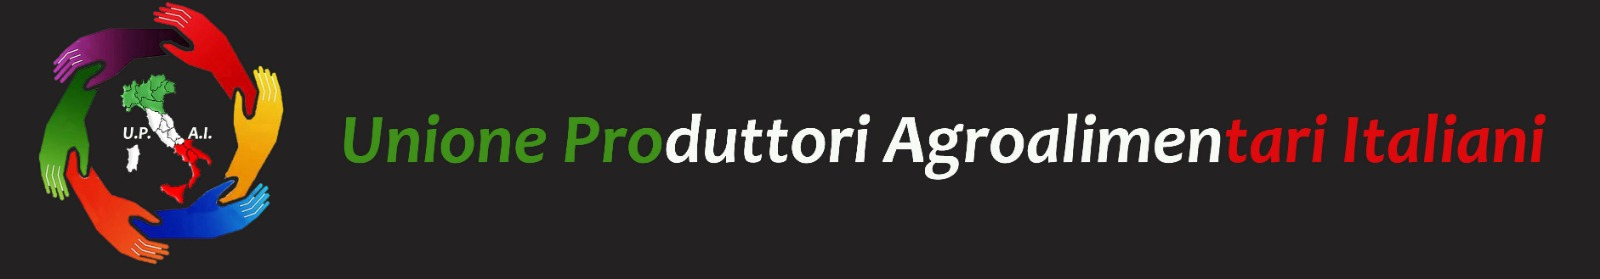 UPAI - Unione Produttori Agroalimentari Italiani